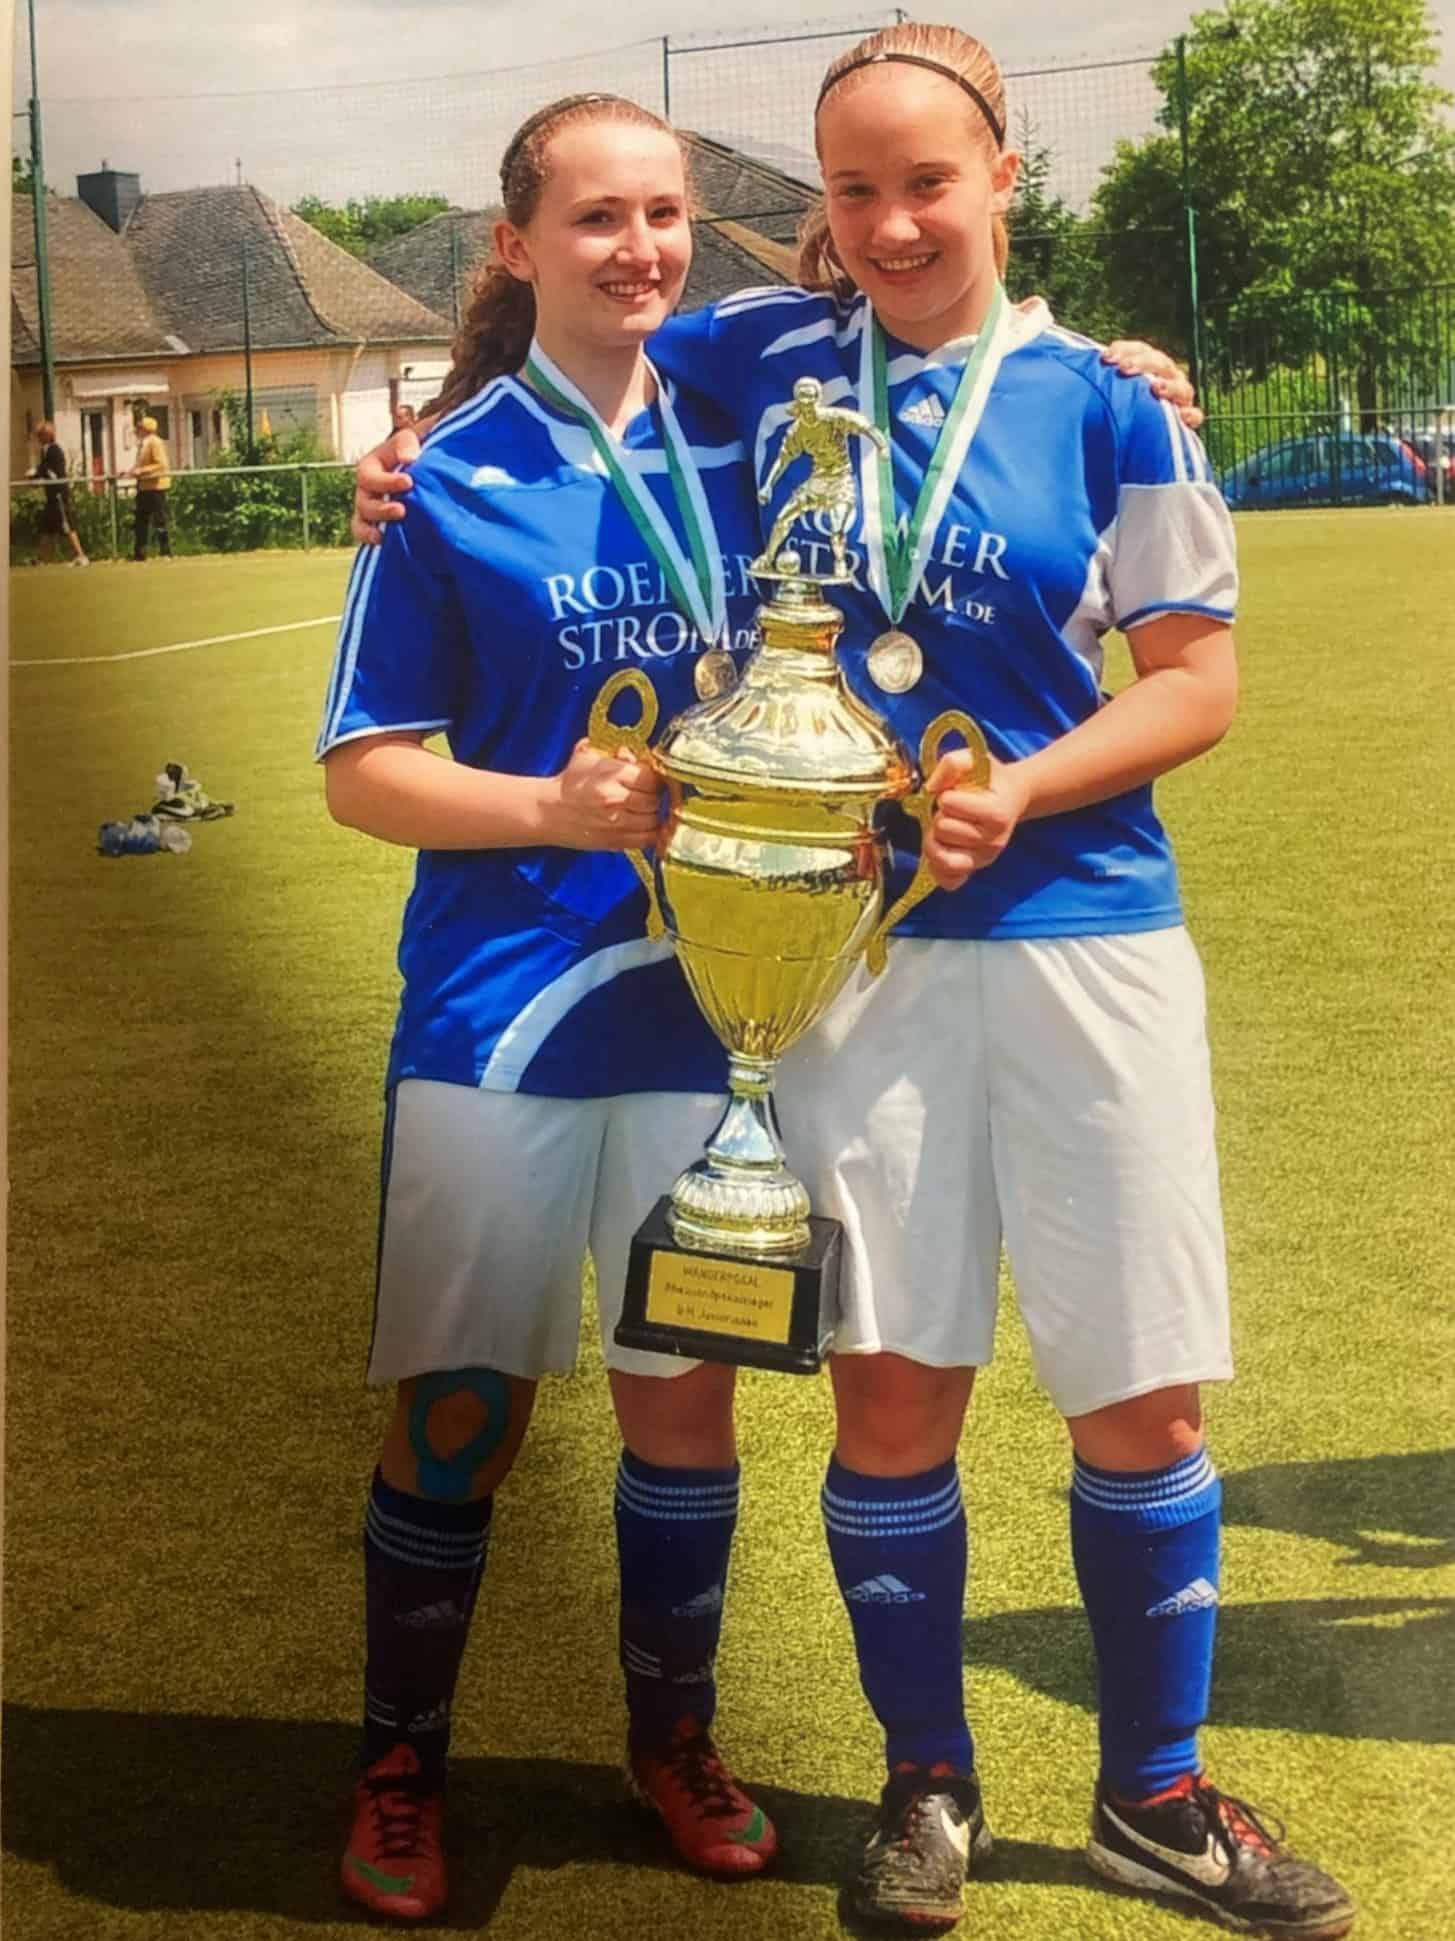 Sarah und Franzi mit Pokal